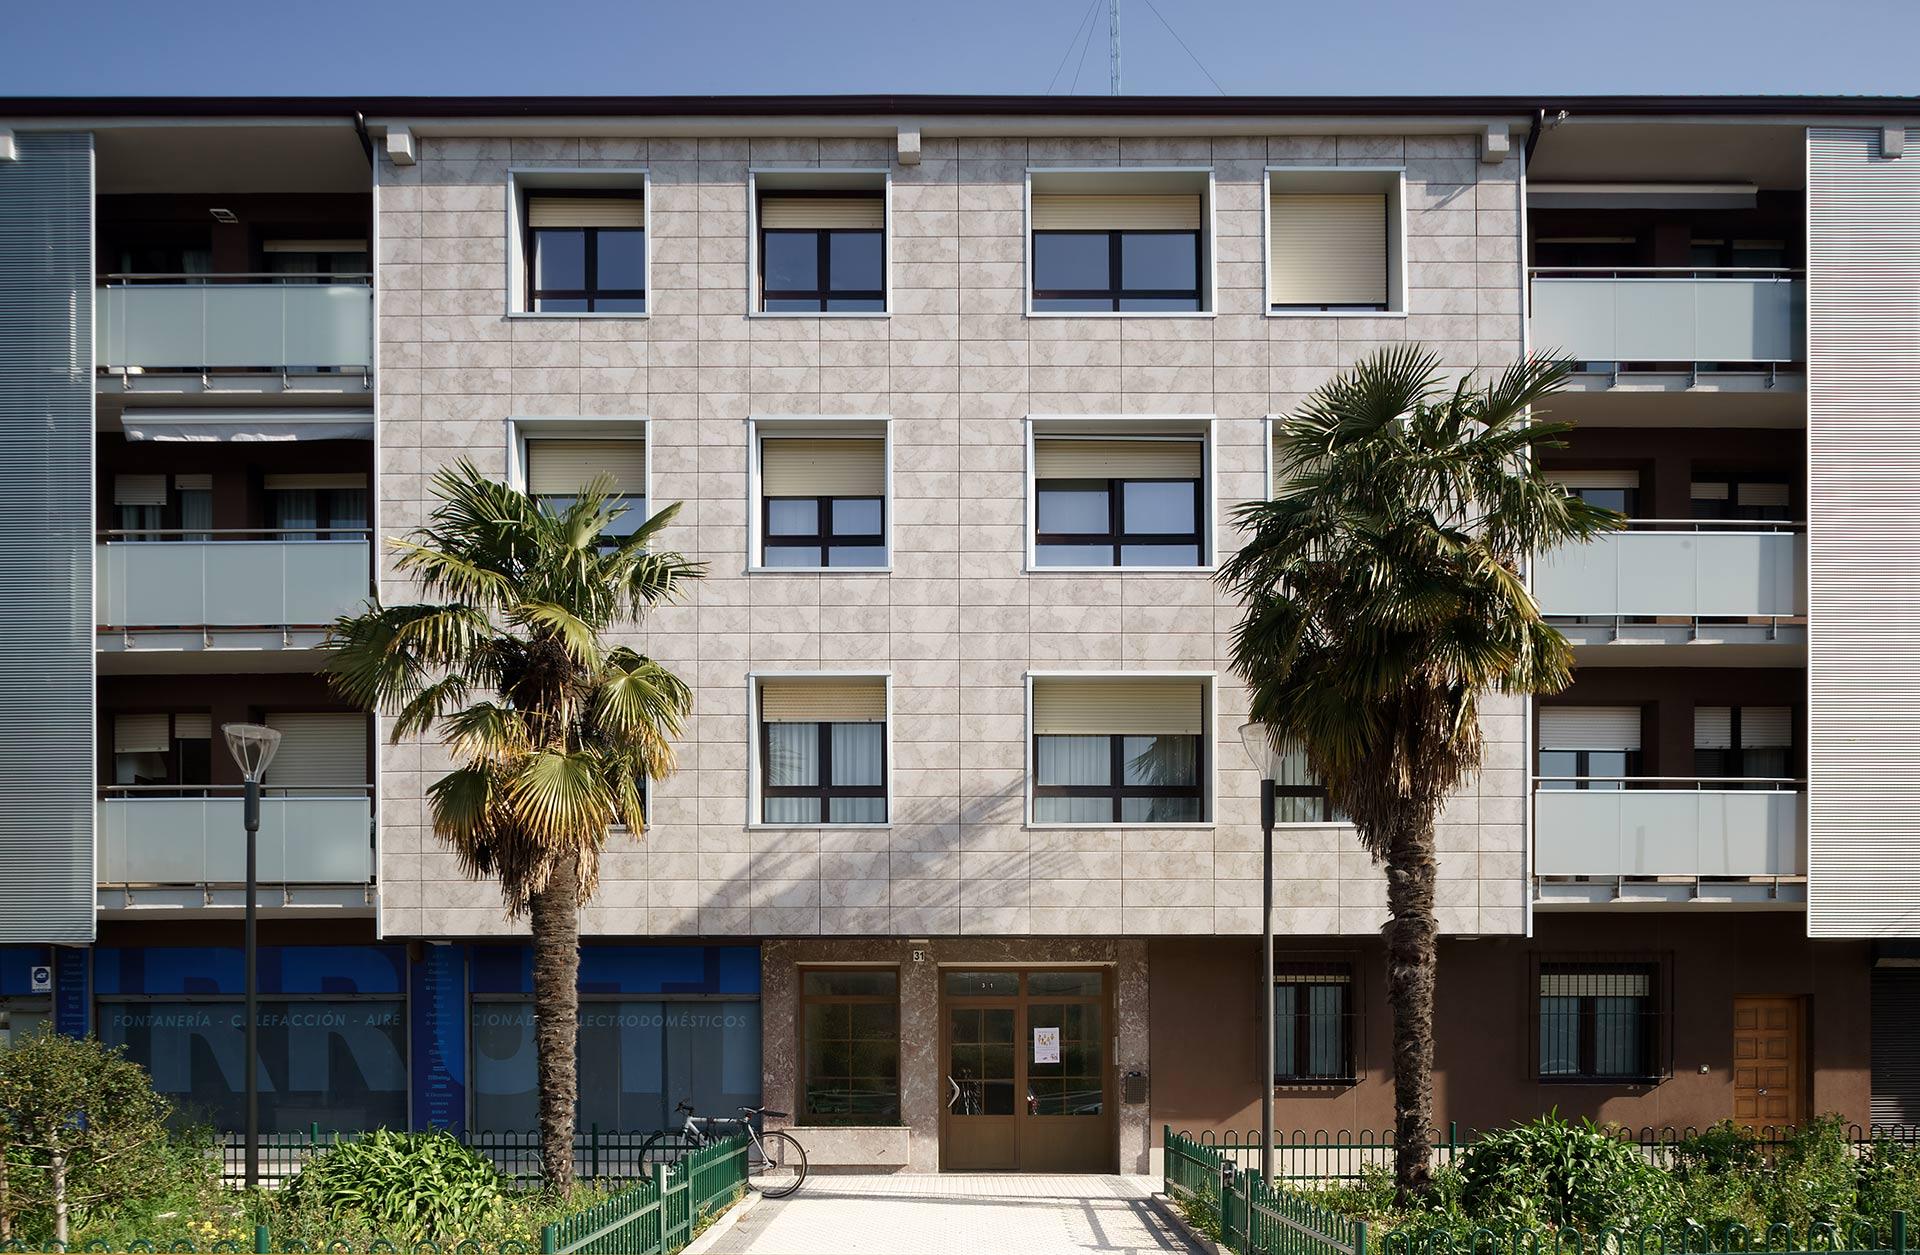 Rehabilitacion-energetica-fachada_aislamiento_District-Heating_BASA-Arquitectura_San-Sebastian-Donosti_2_b